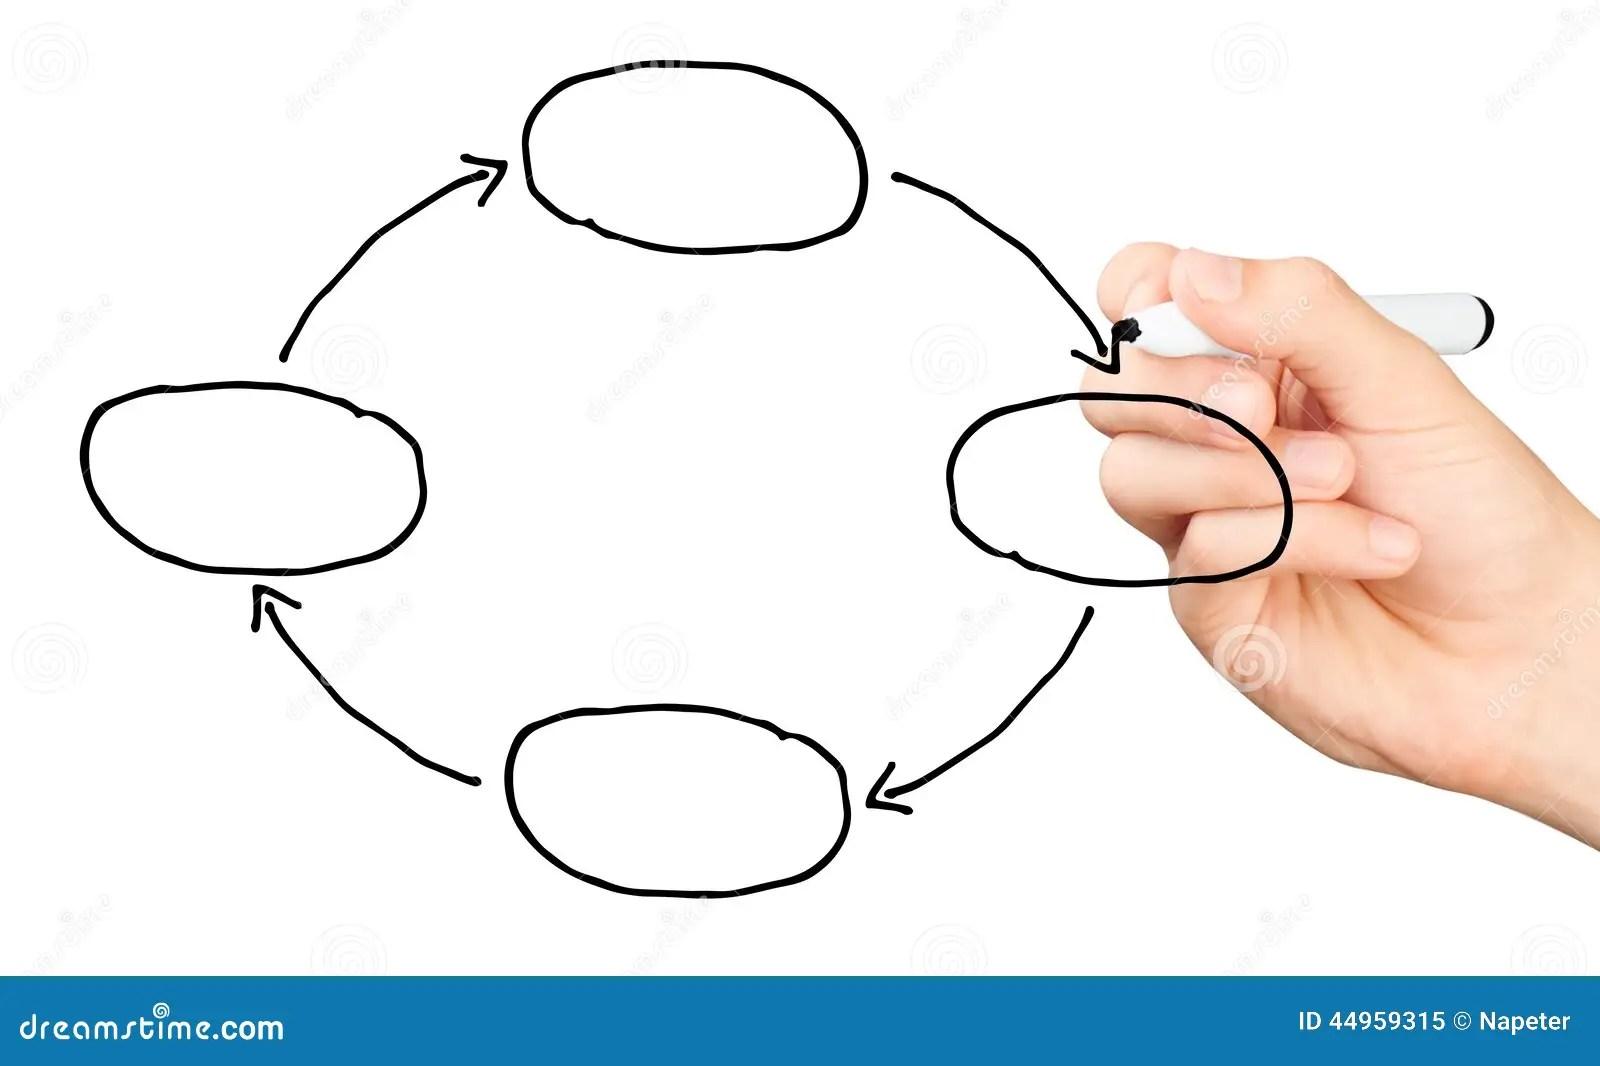 hight resolution of blank foot diagram wiring diagrams rh 18 vesterbro de blank foot bone diagram wrist and hand anatomy blank